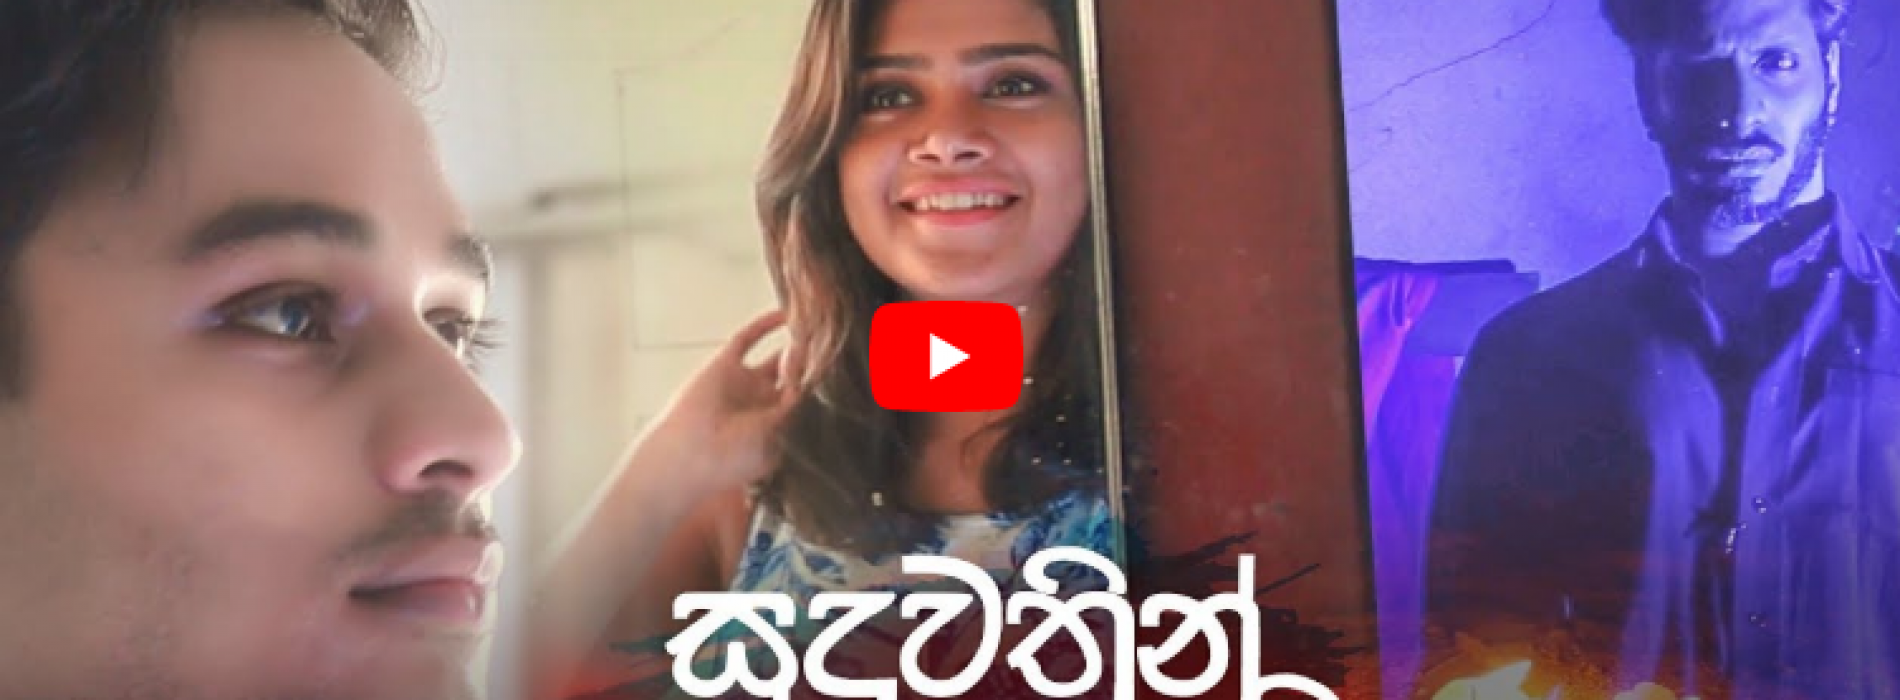 Suduwathin Sarasee (සුදු වතින් සැරසී) – Javeen Soysa Official Music Video (2019)